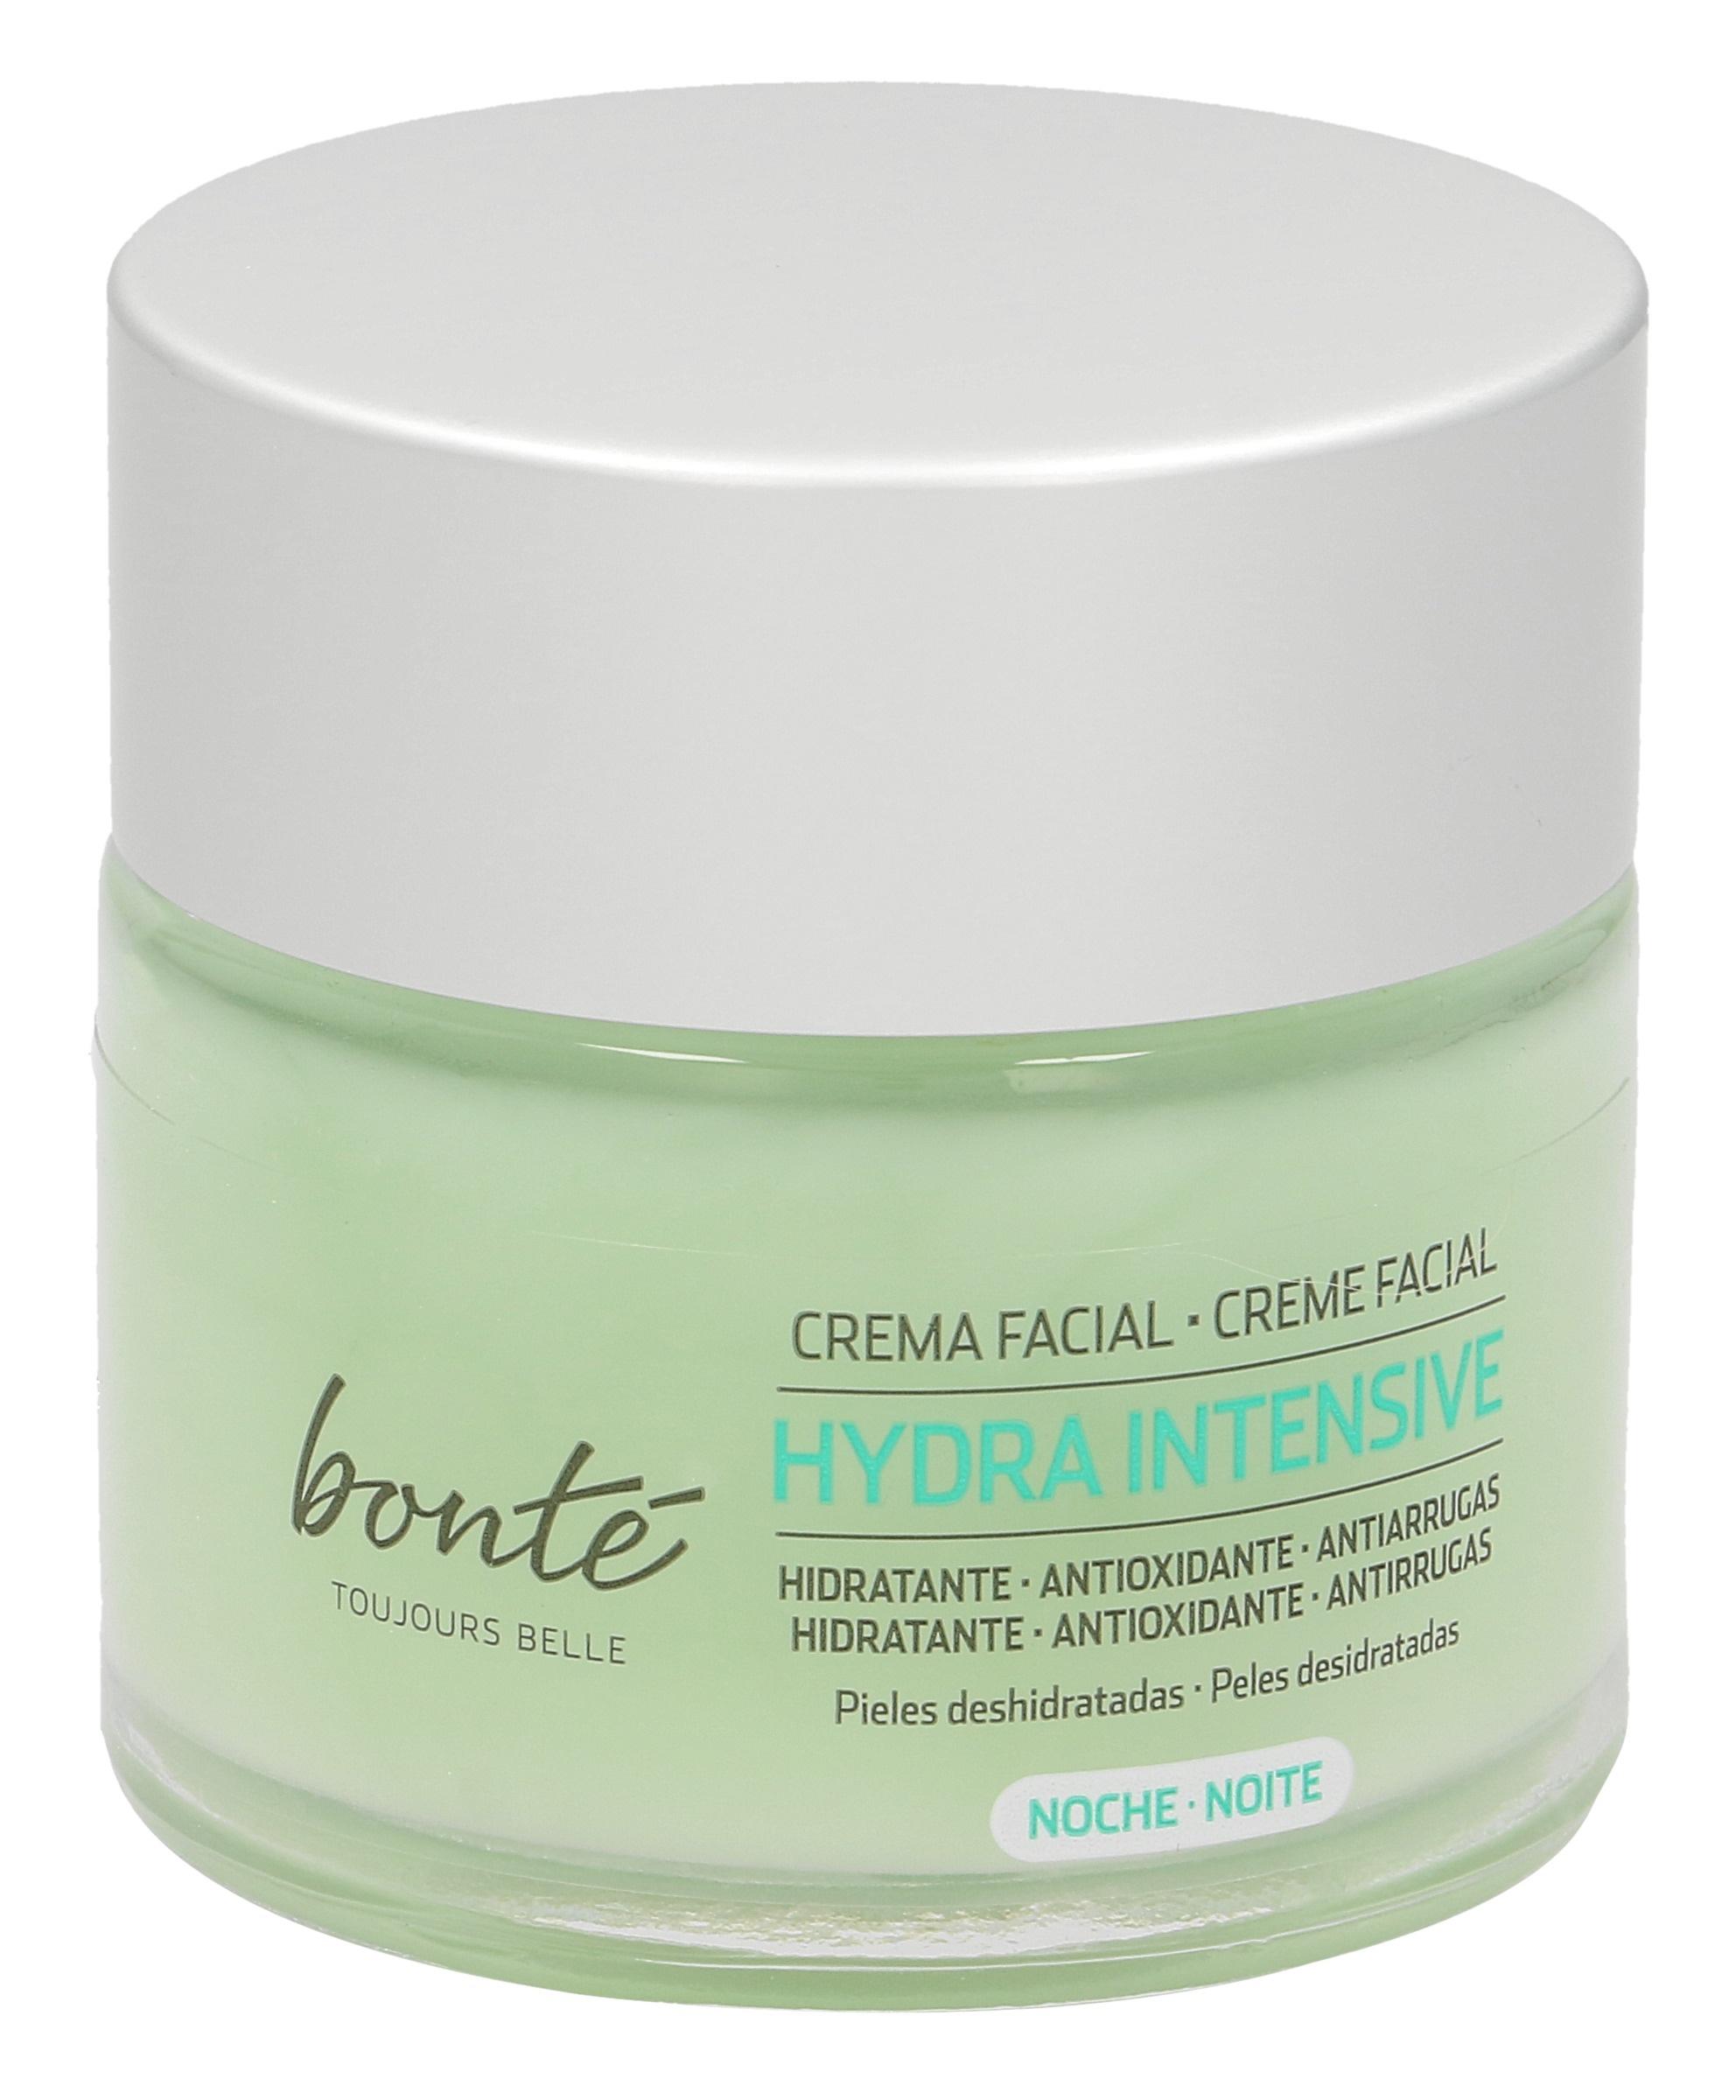 Bonté Crema Facial Hydra Noche Intense Pieles Deshidratadas Tarro